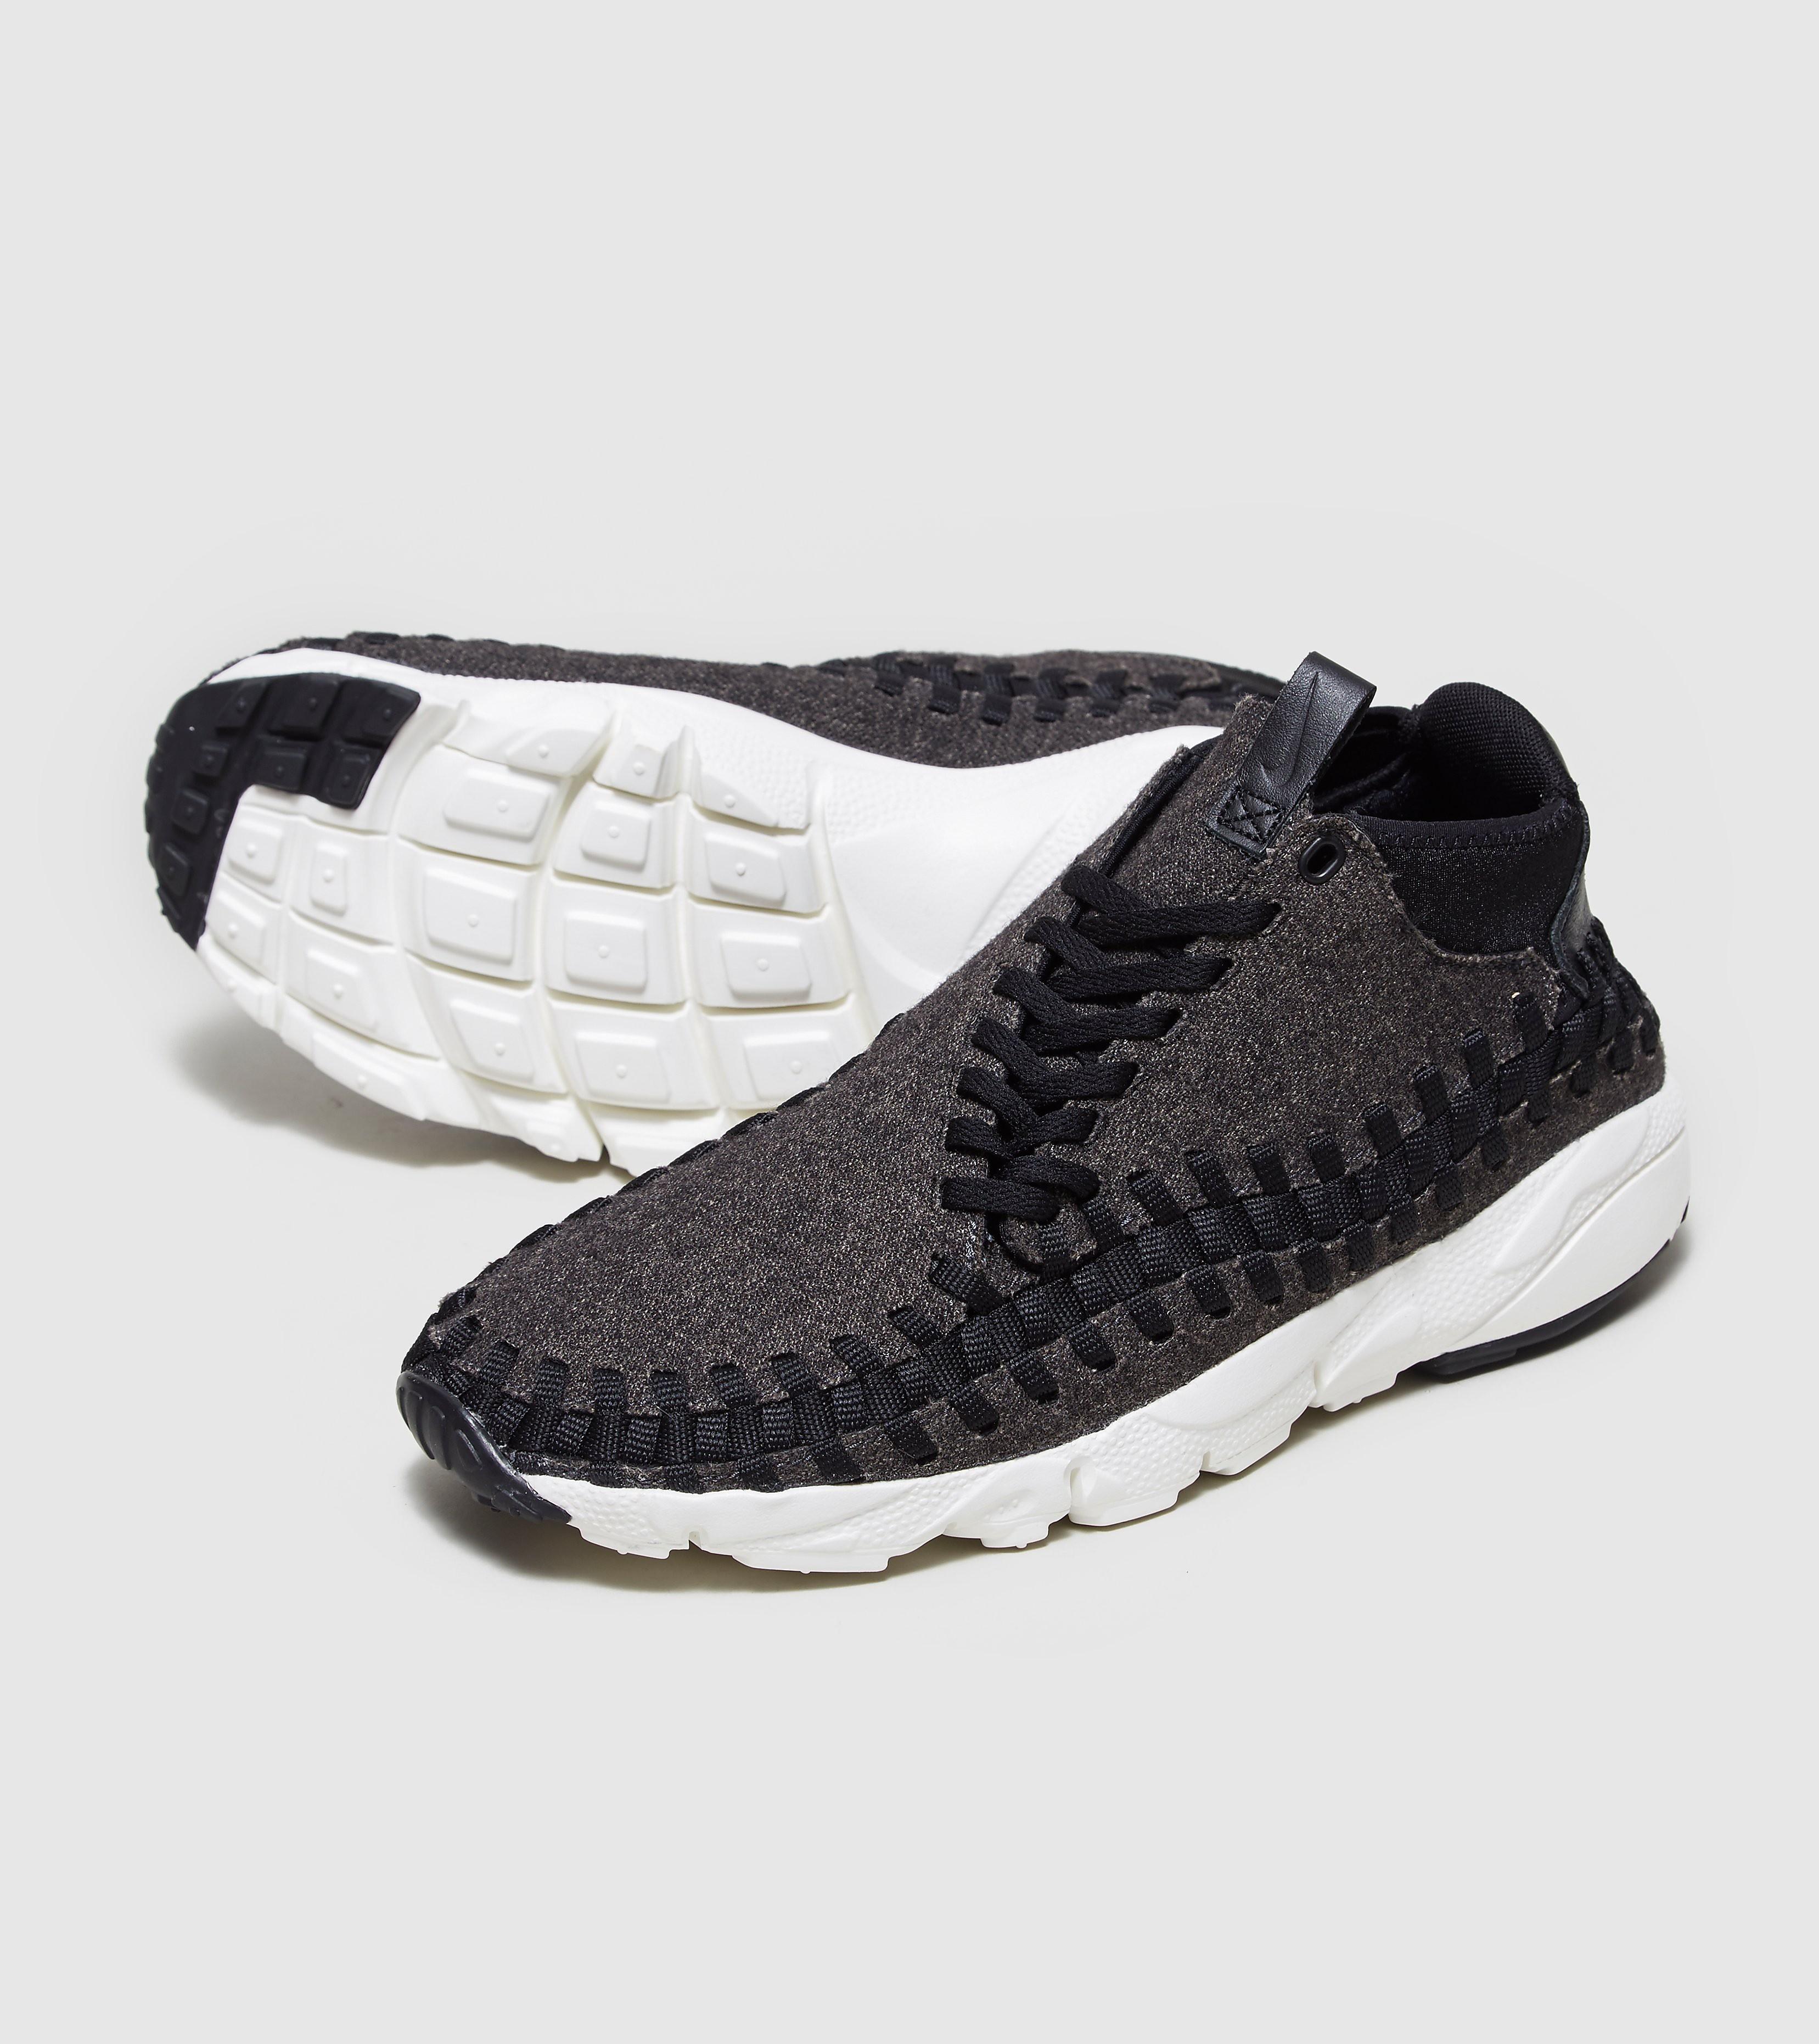 Nike Air Footscape Woven Chukka Women's